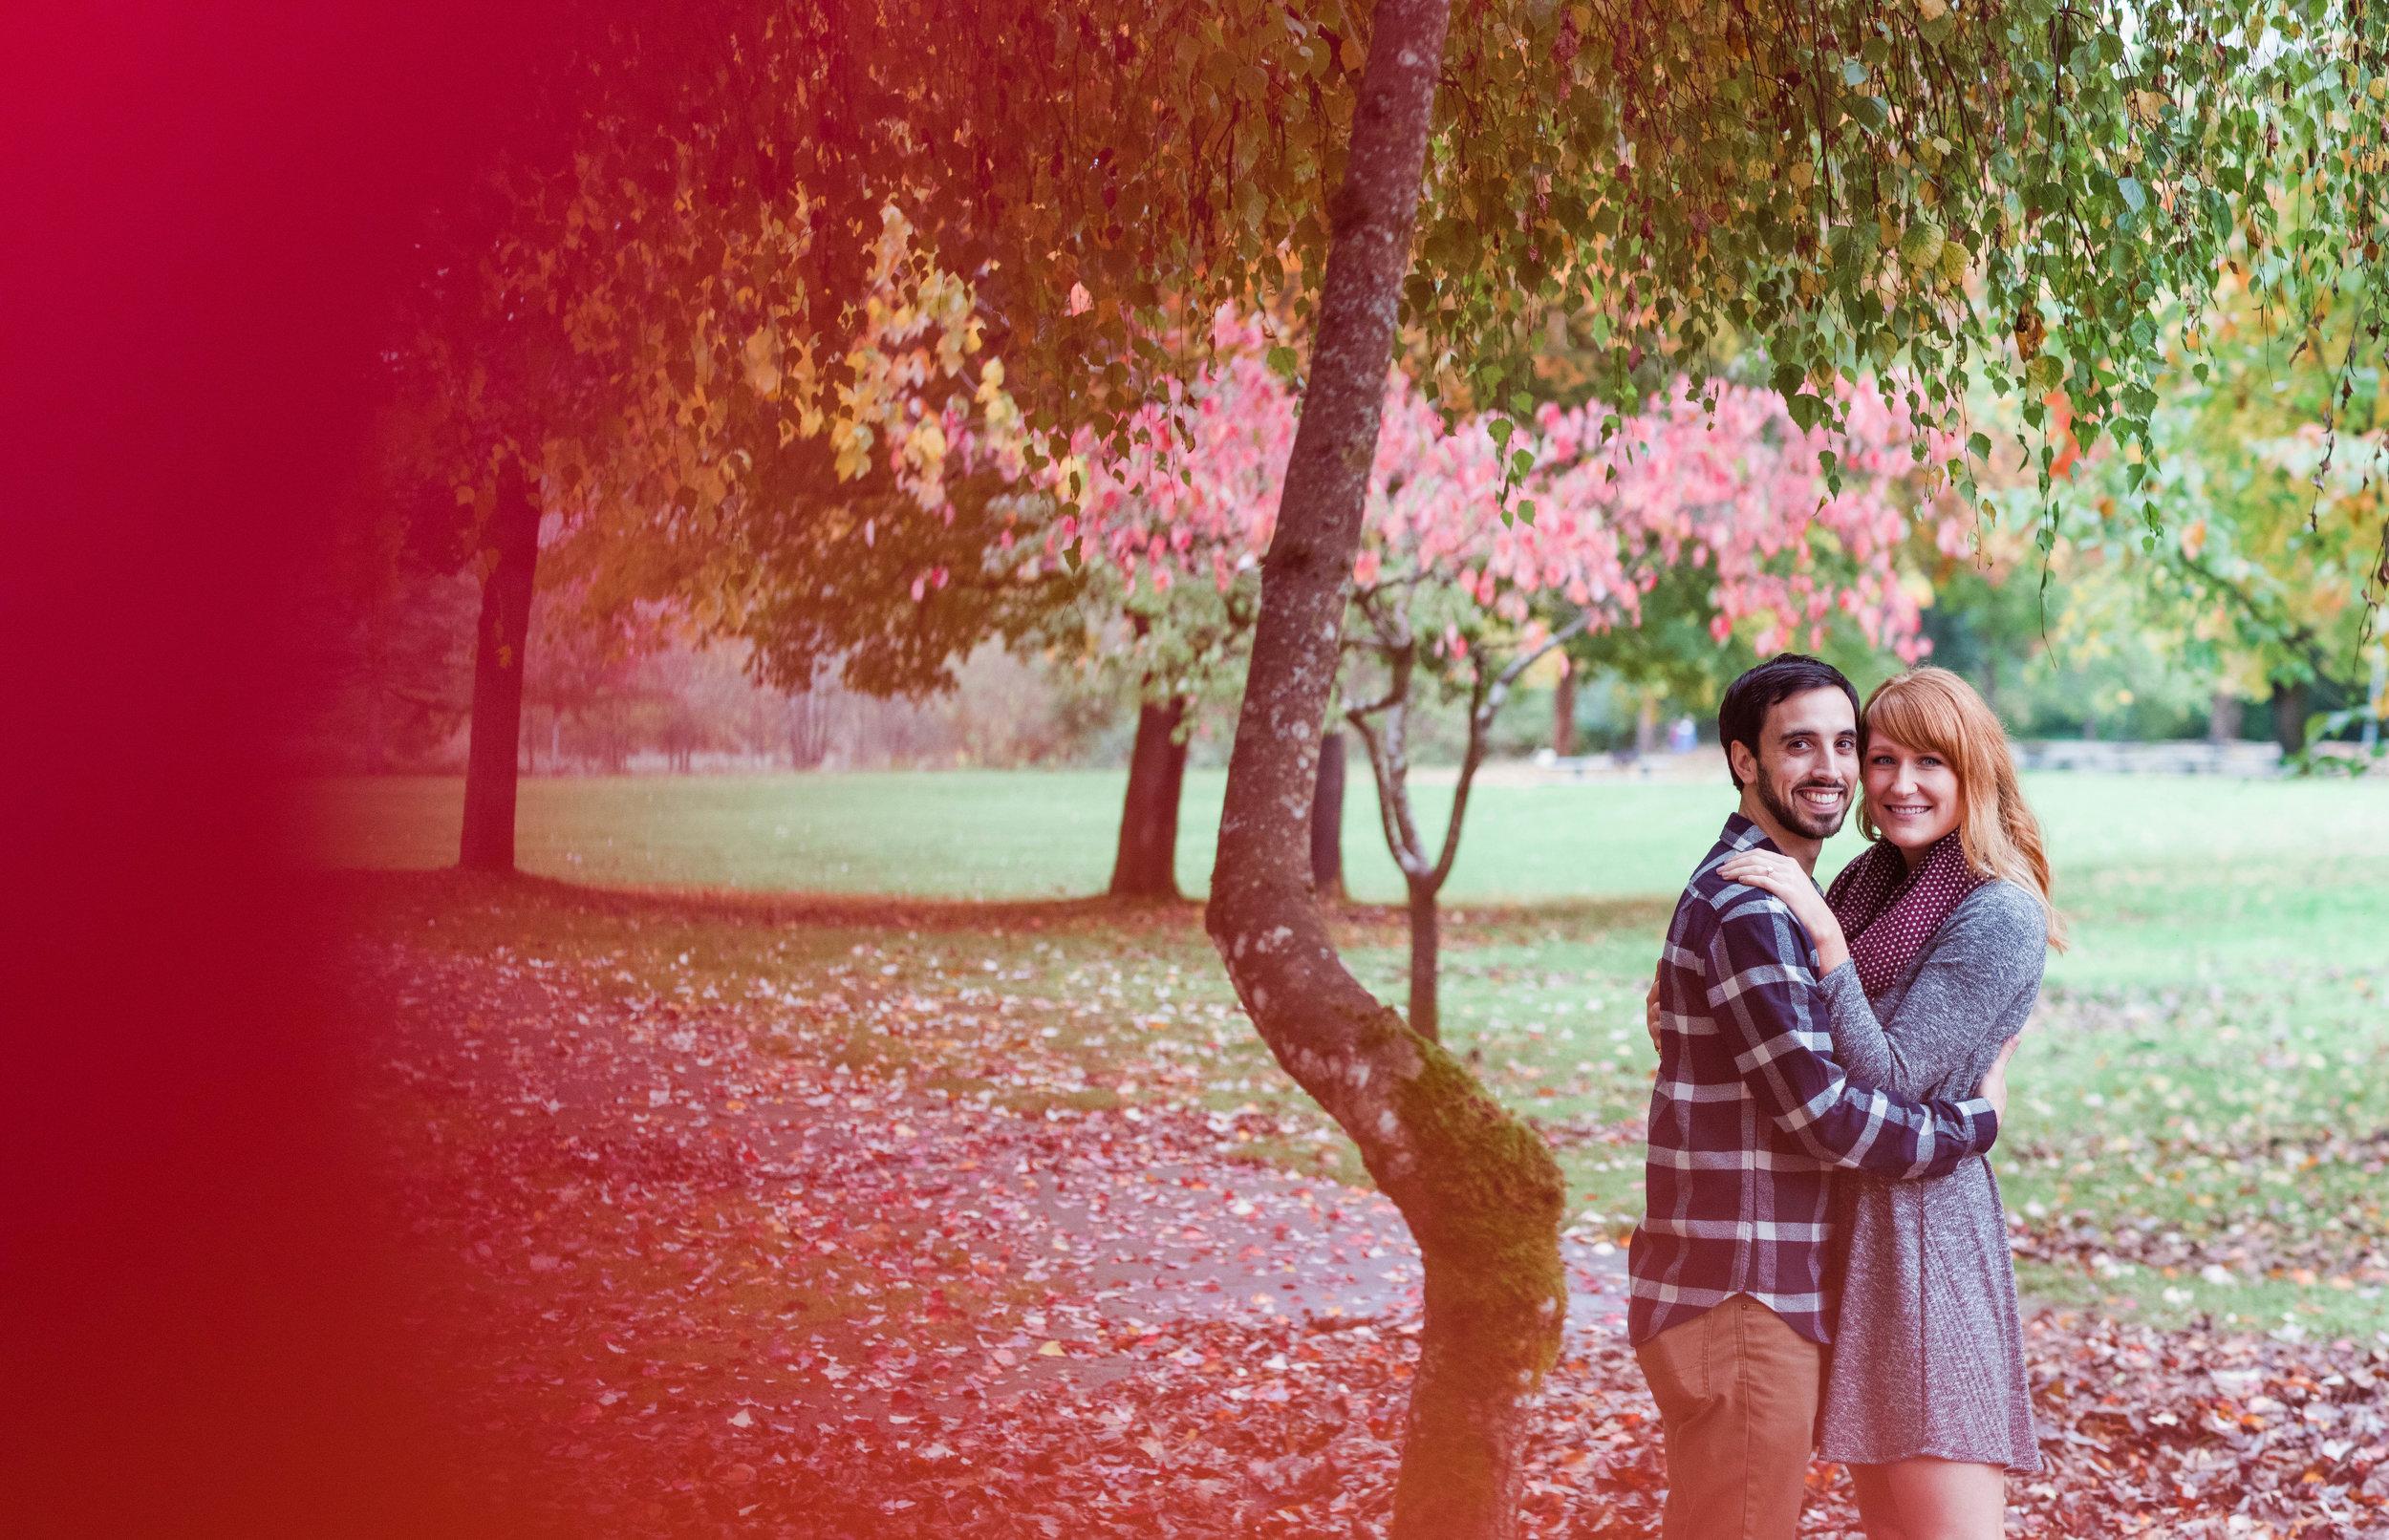 Ryan+Nicole_Franklin+Falls+Engagement_APW2016_45.JPG